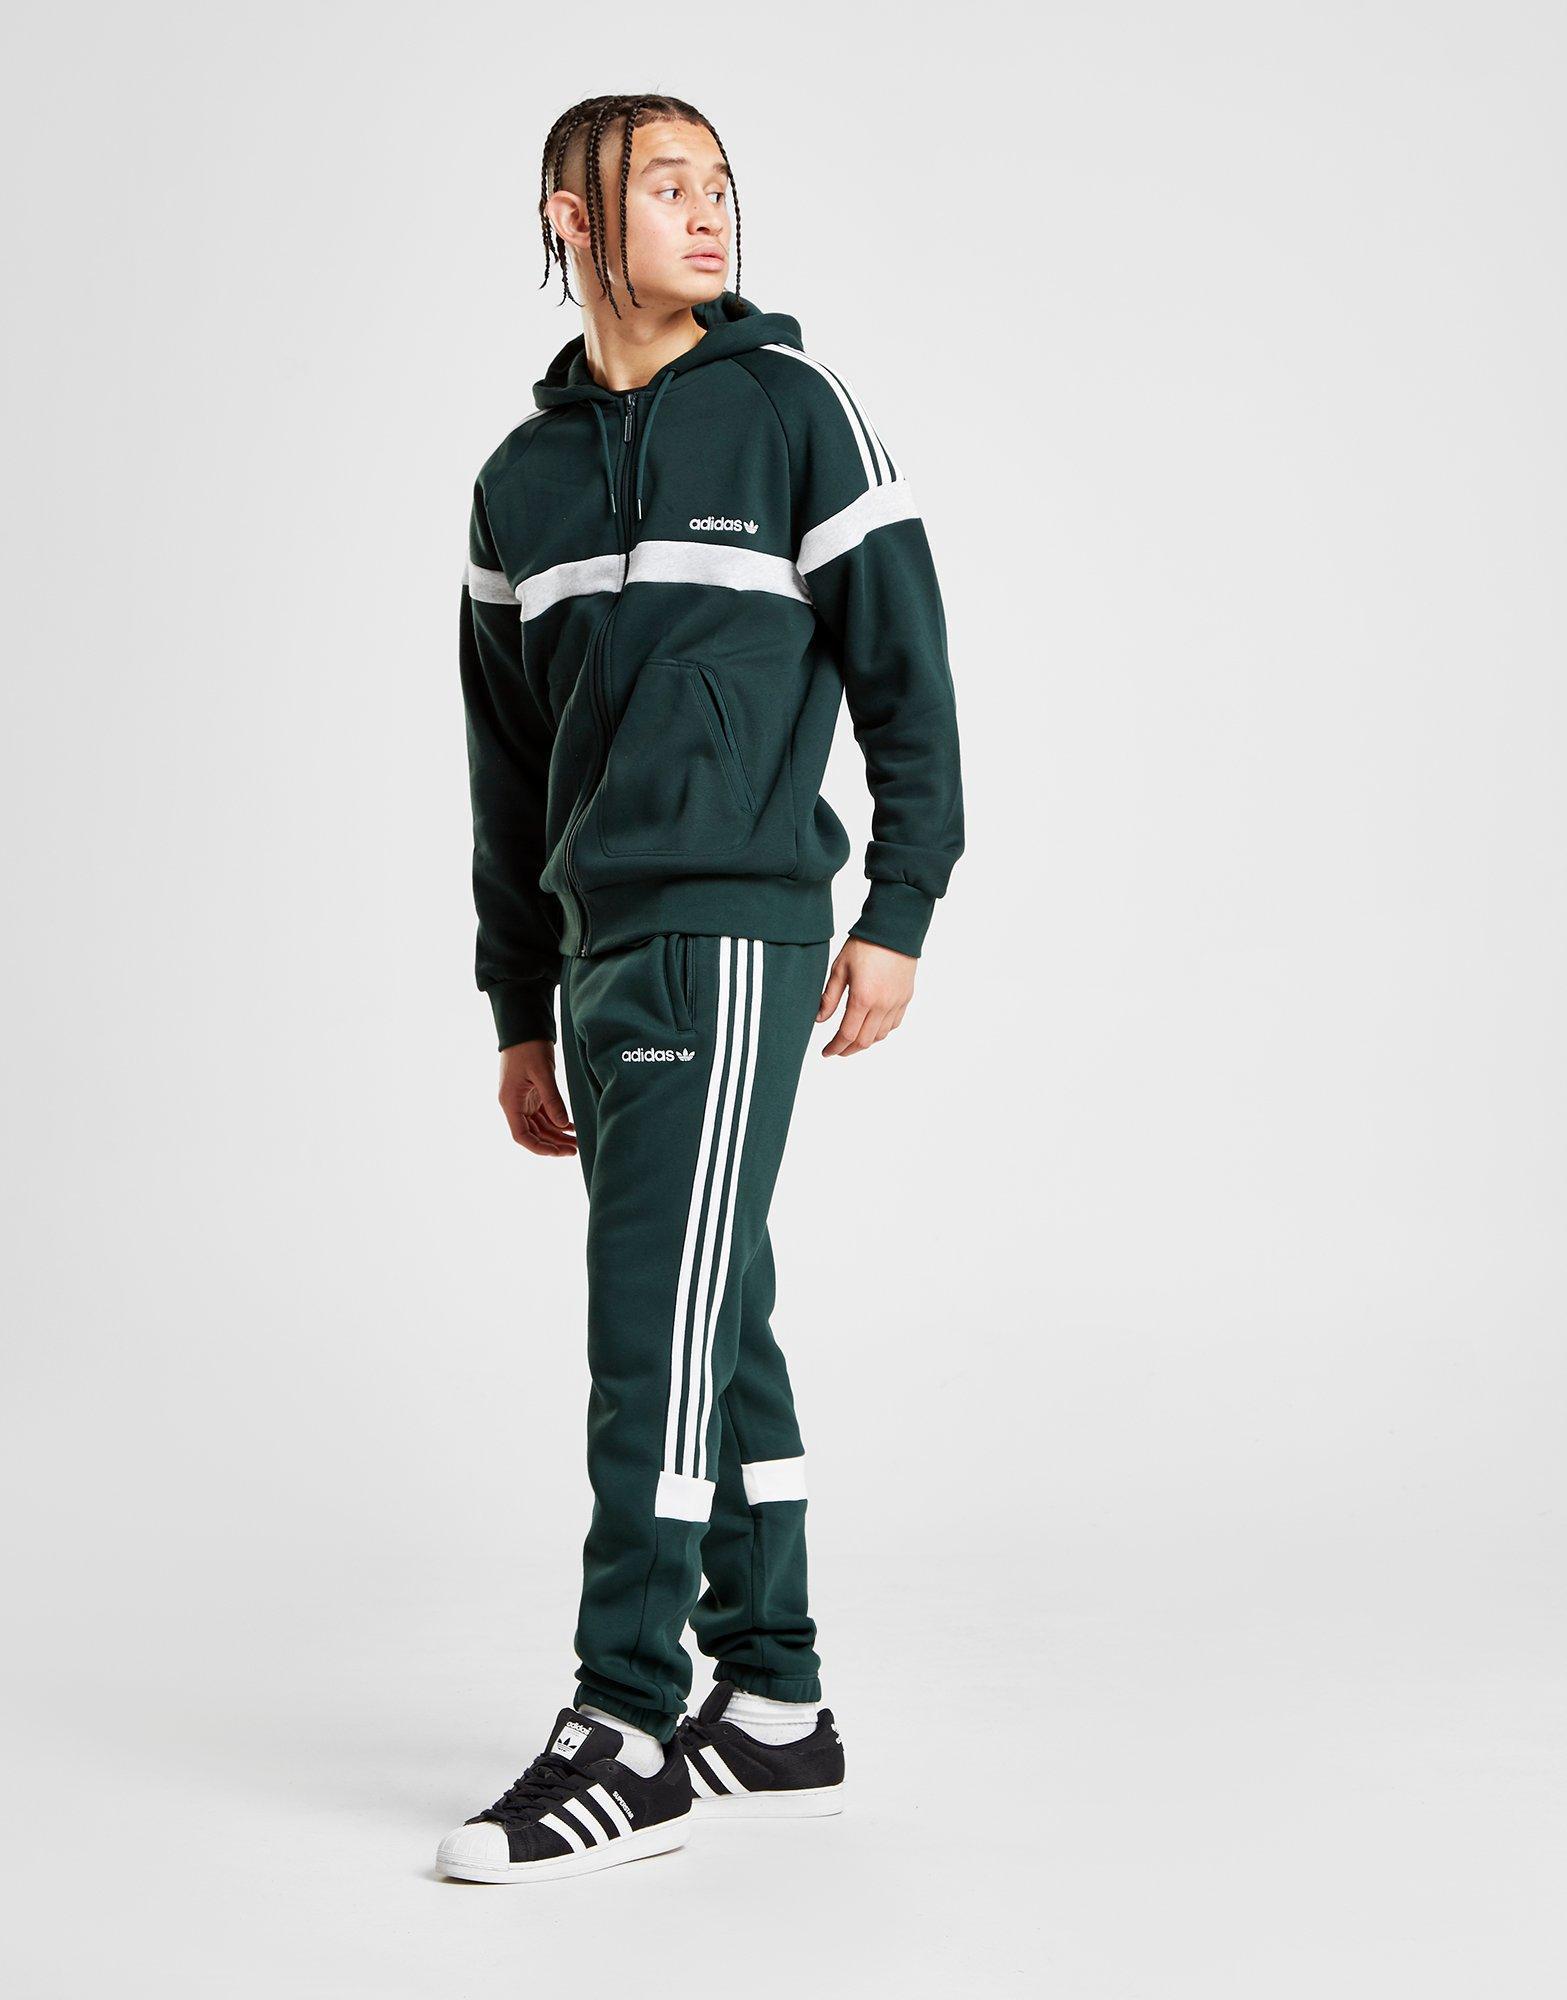 Pants In Men Adidas Originals Itasca Lyst For Track Green Fleece kuTOZiPX